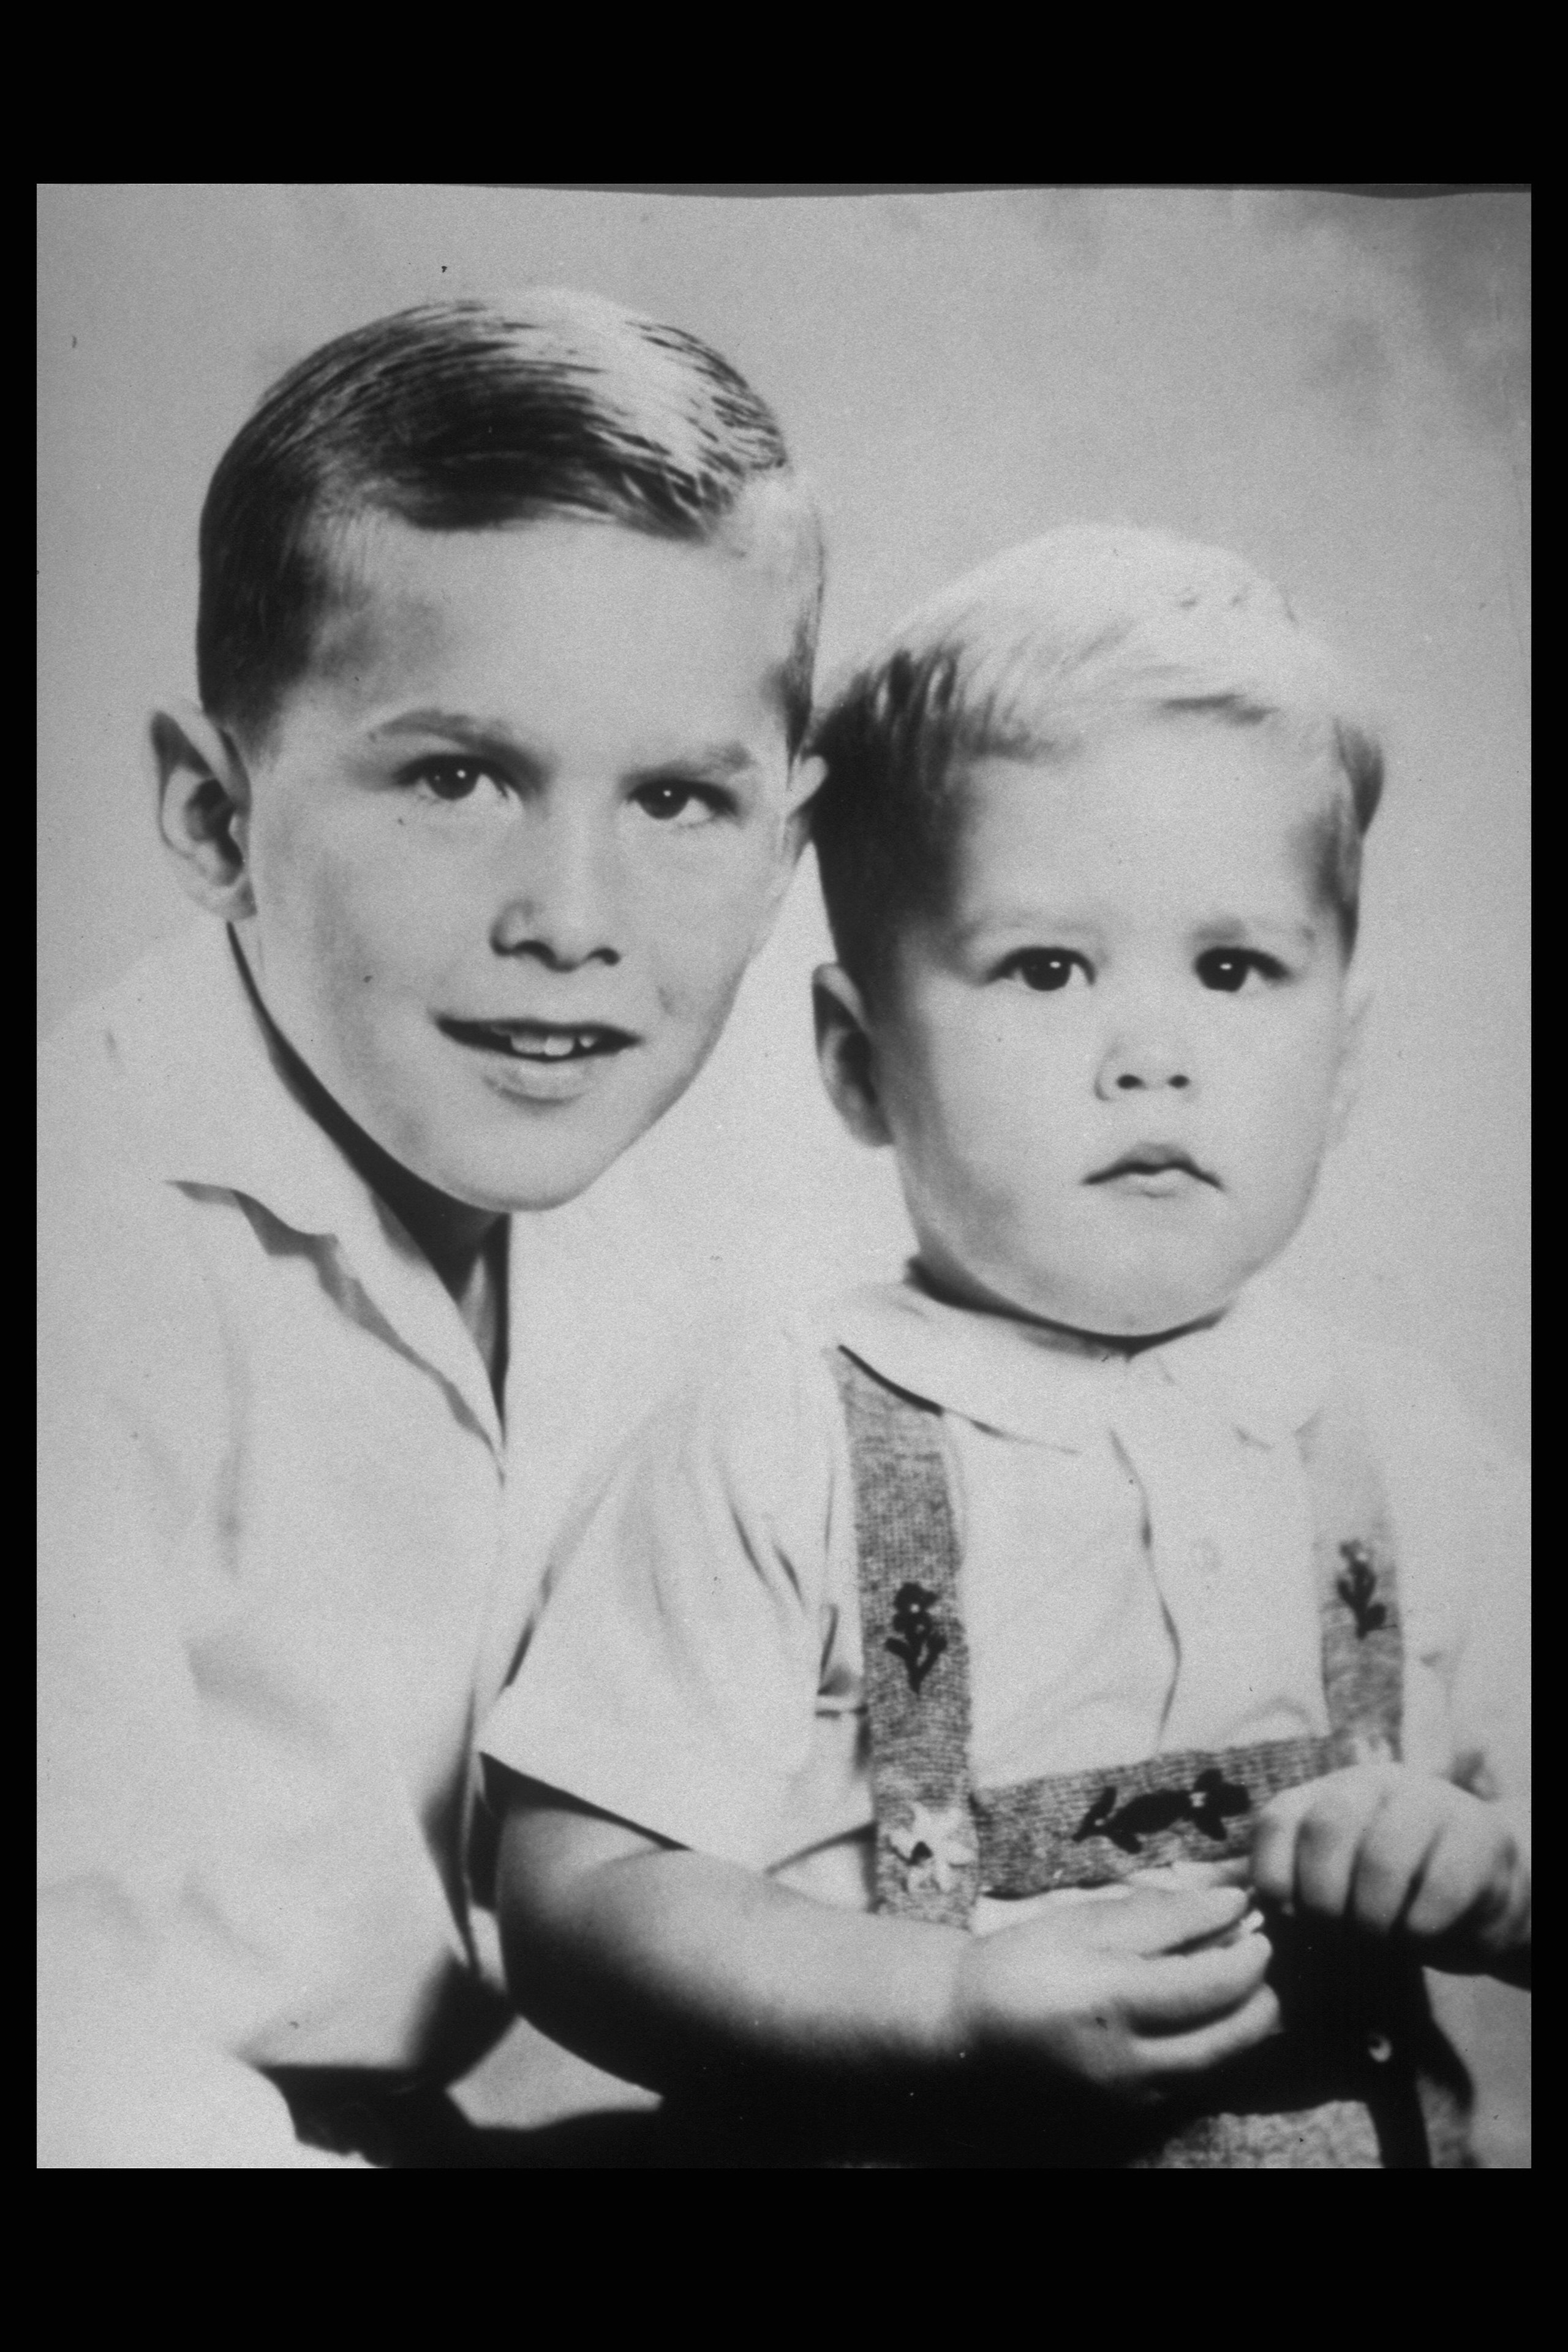 George W. Bush and Jeb Bush, Jan. 1, 1955.